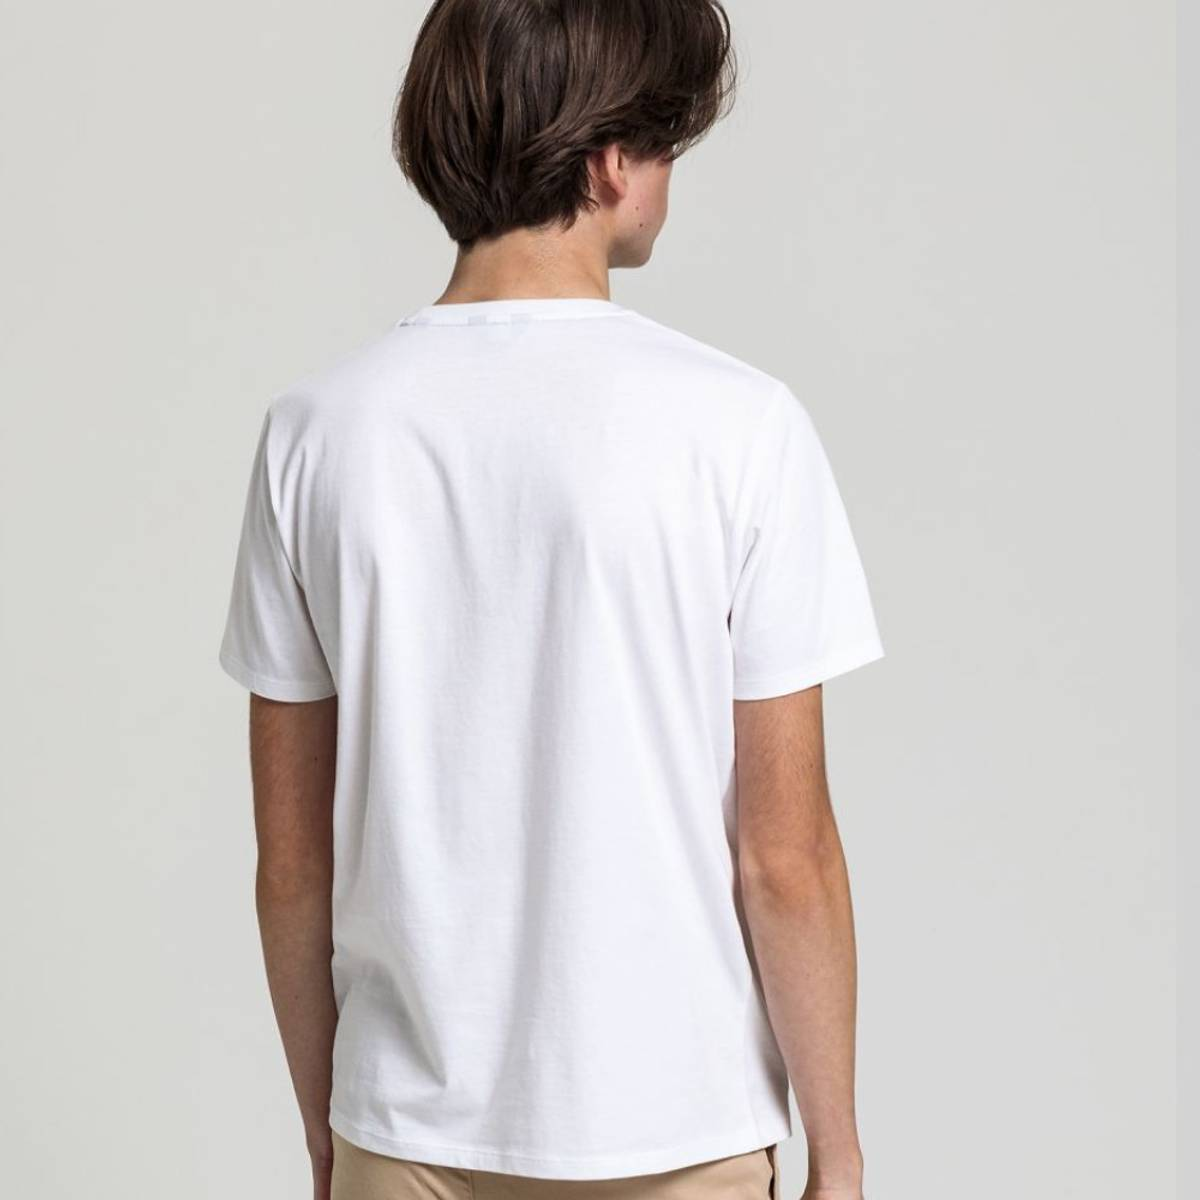 GANT - The Original T-Skjorte Hvit